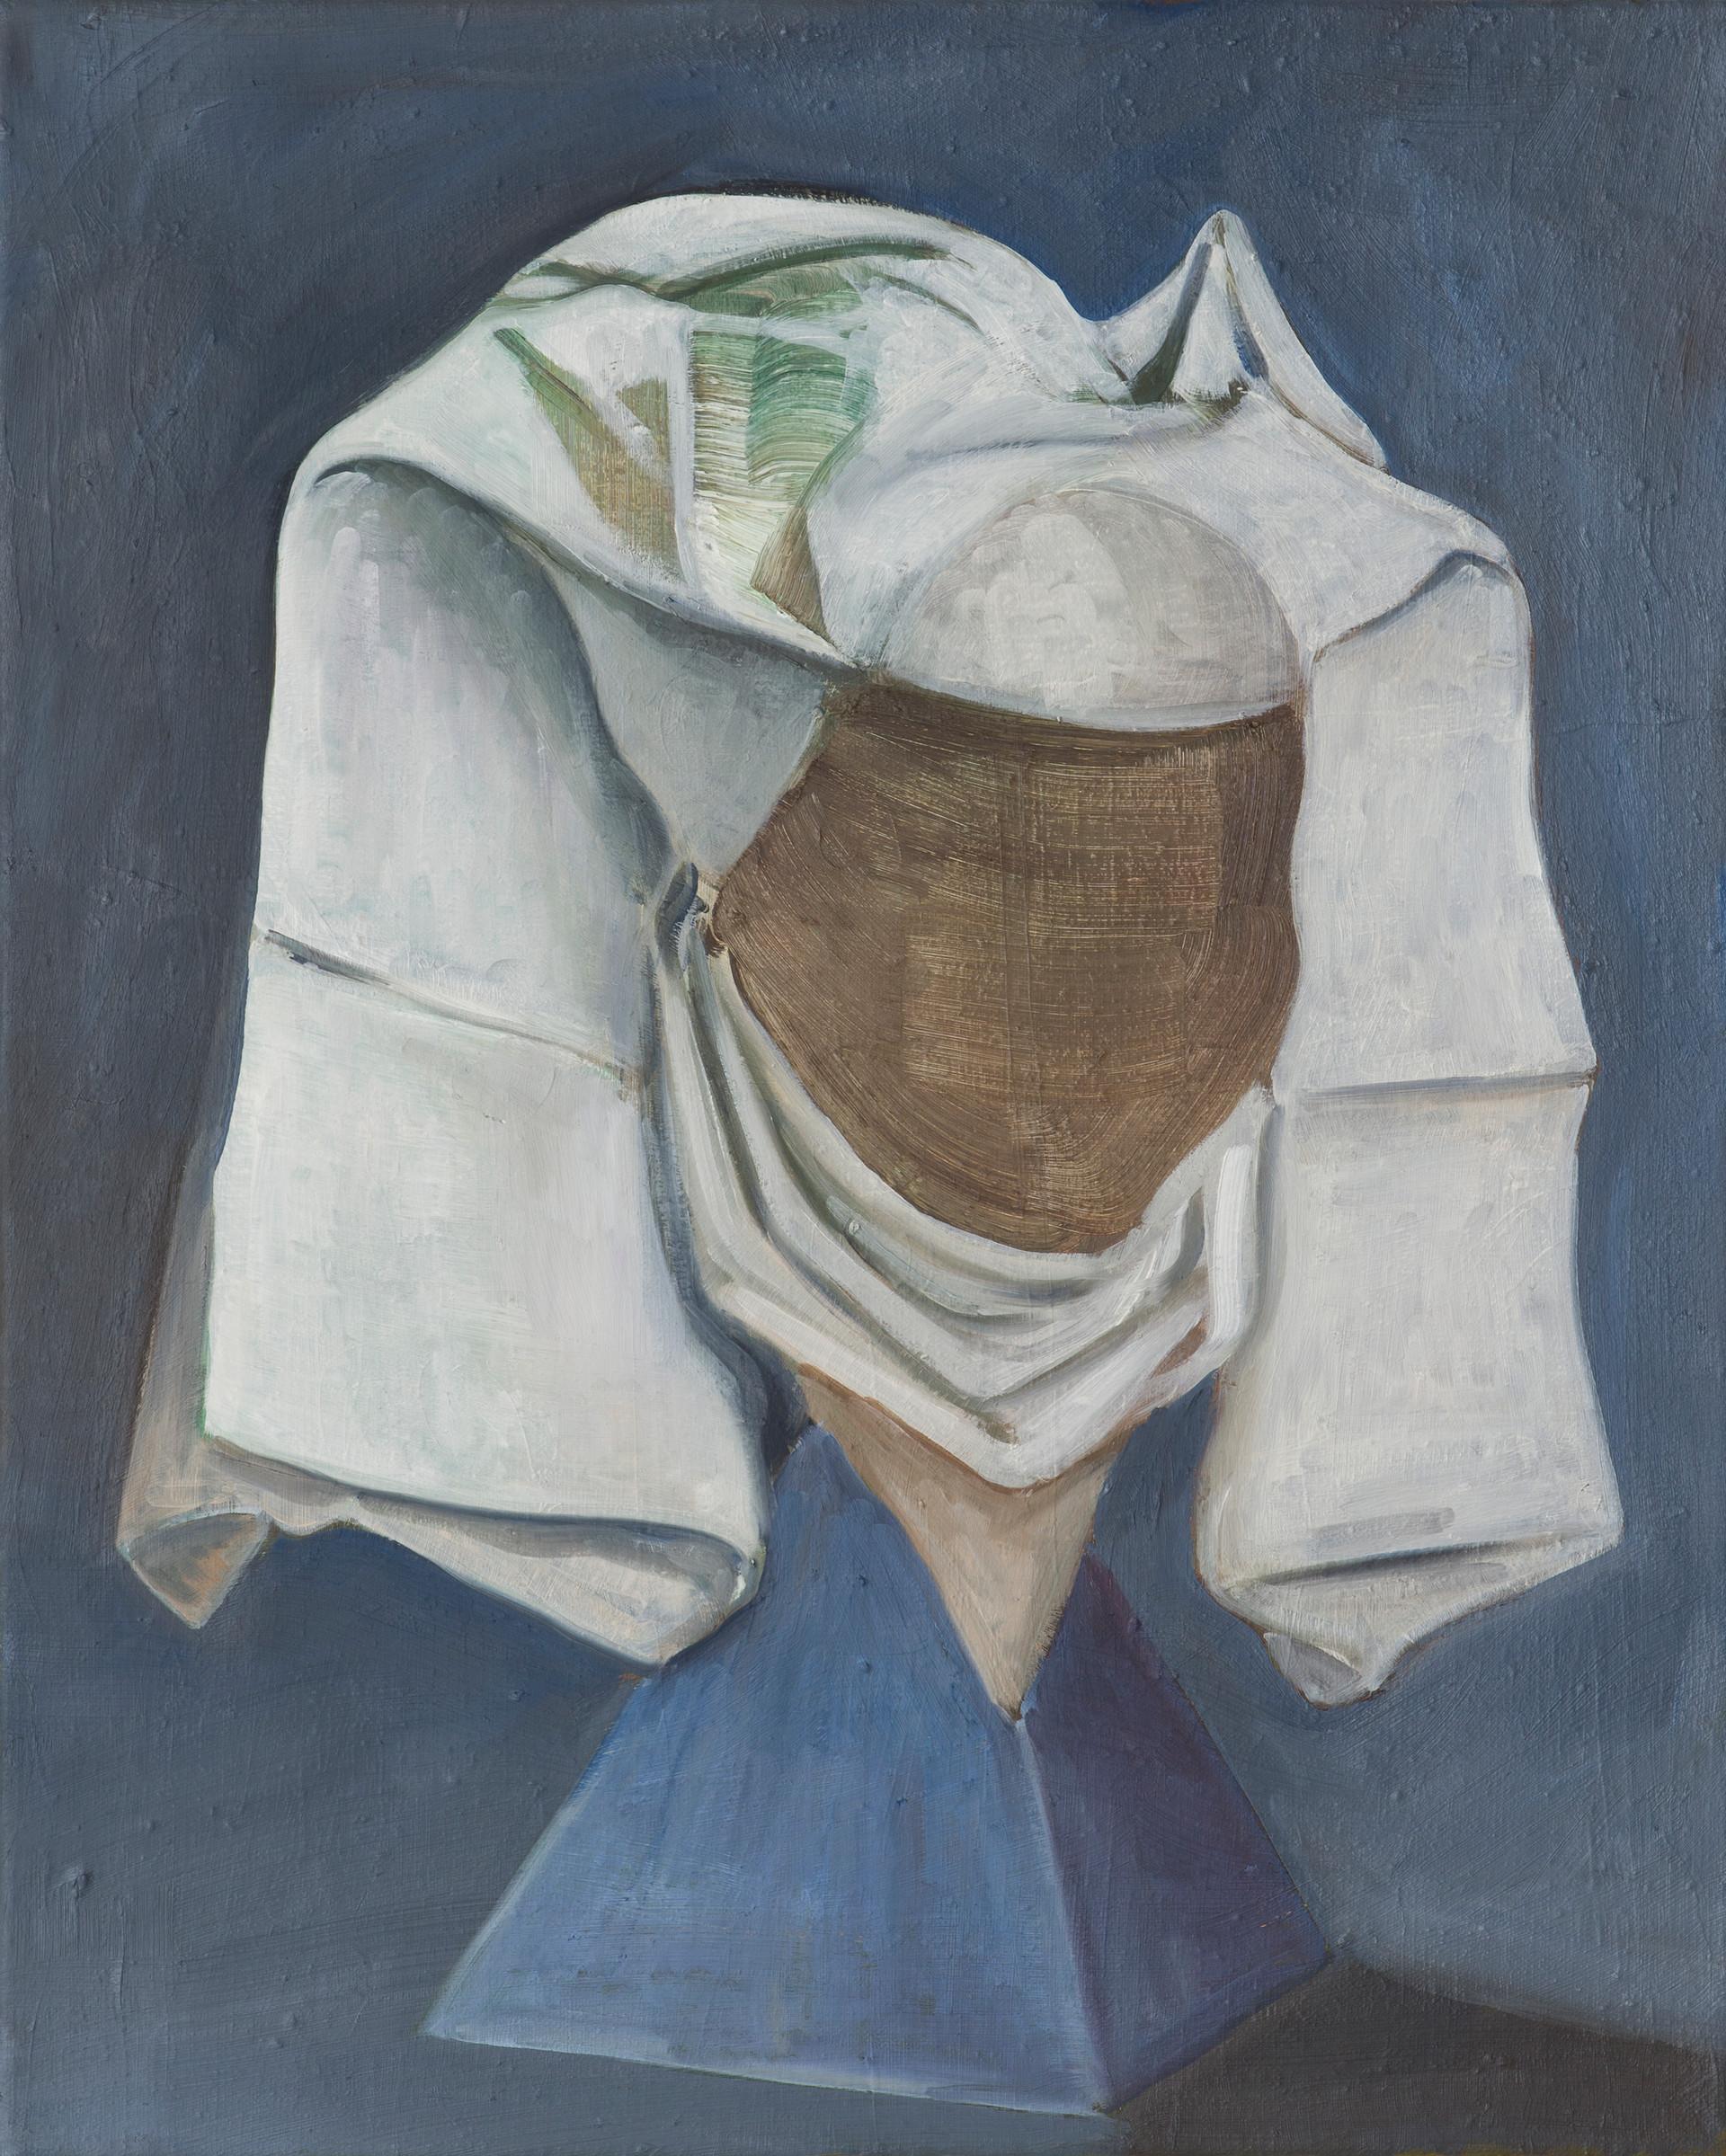 the portrait - 2013 - öl auf leinwand - 60 x 50 cm